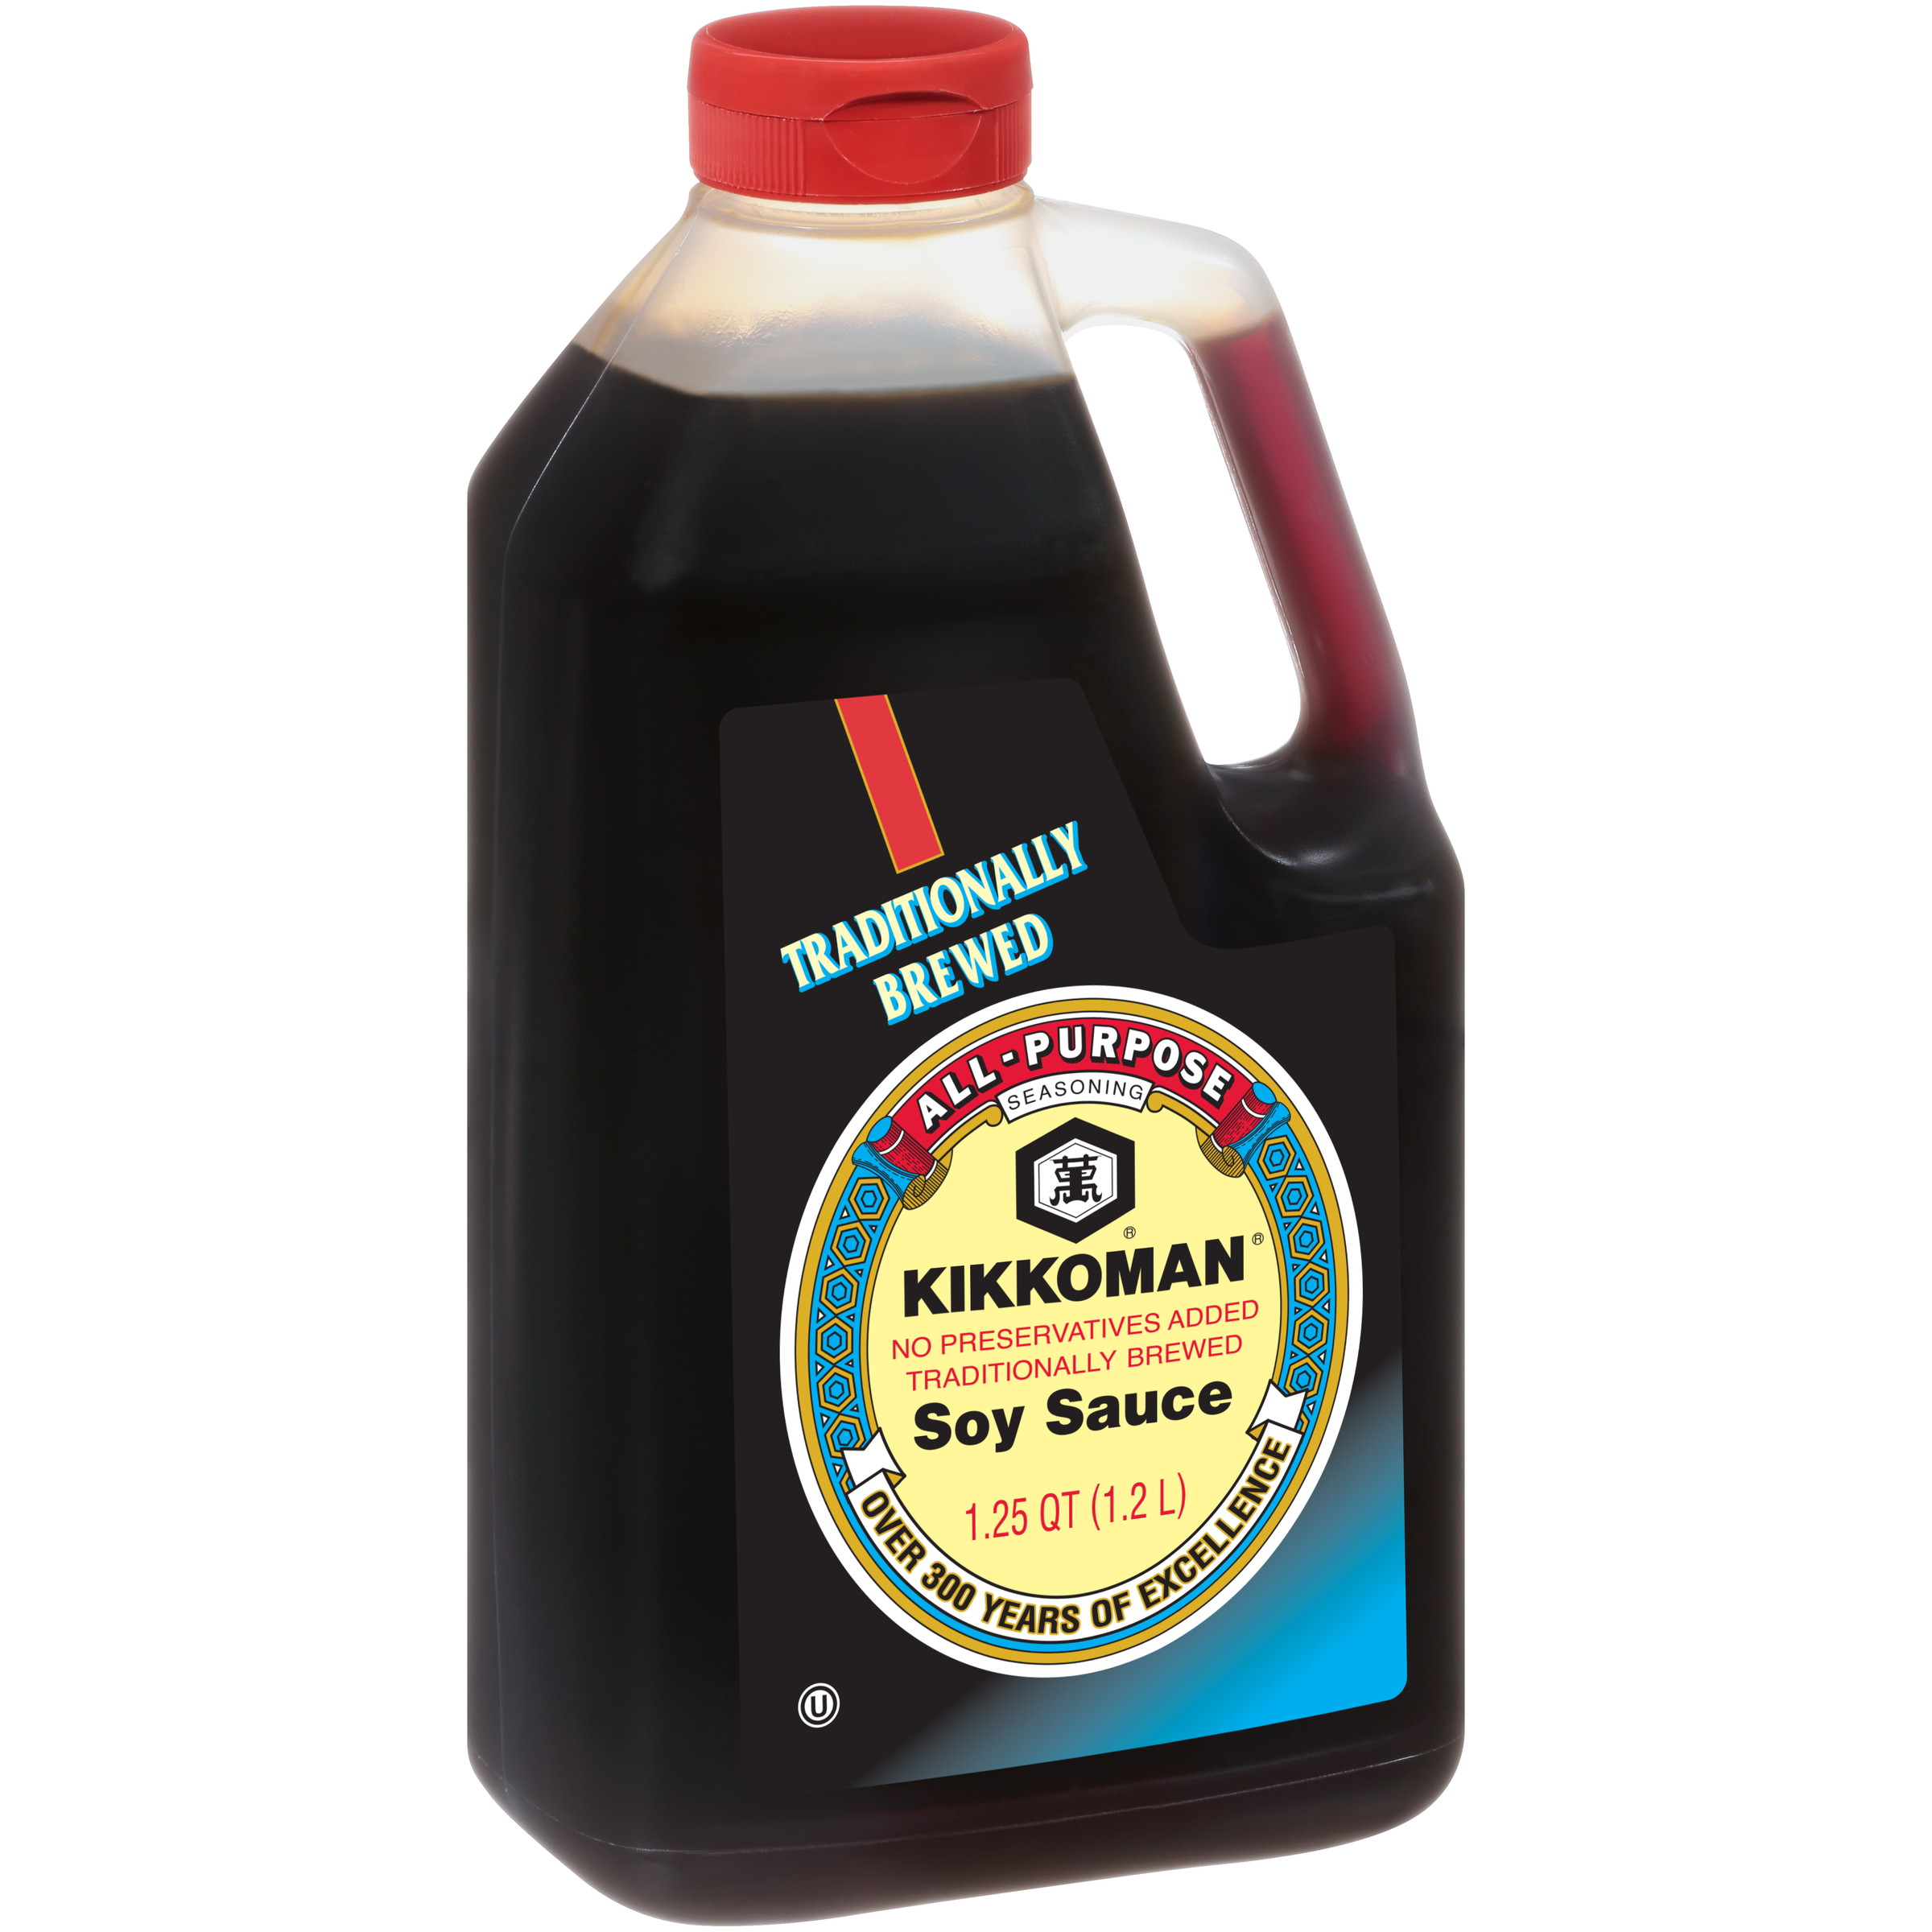 KIKKOMAN Soy Sauce Traditionally Brewed 1.2 L